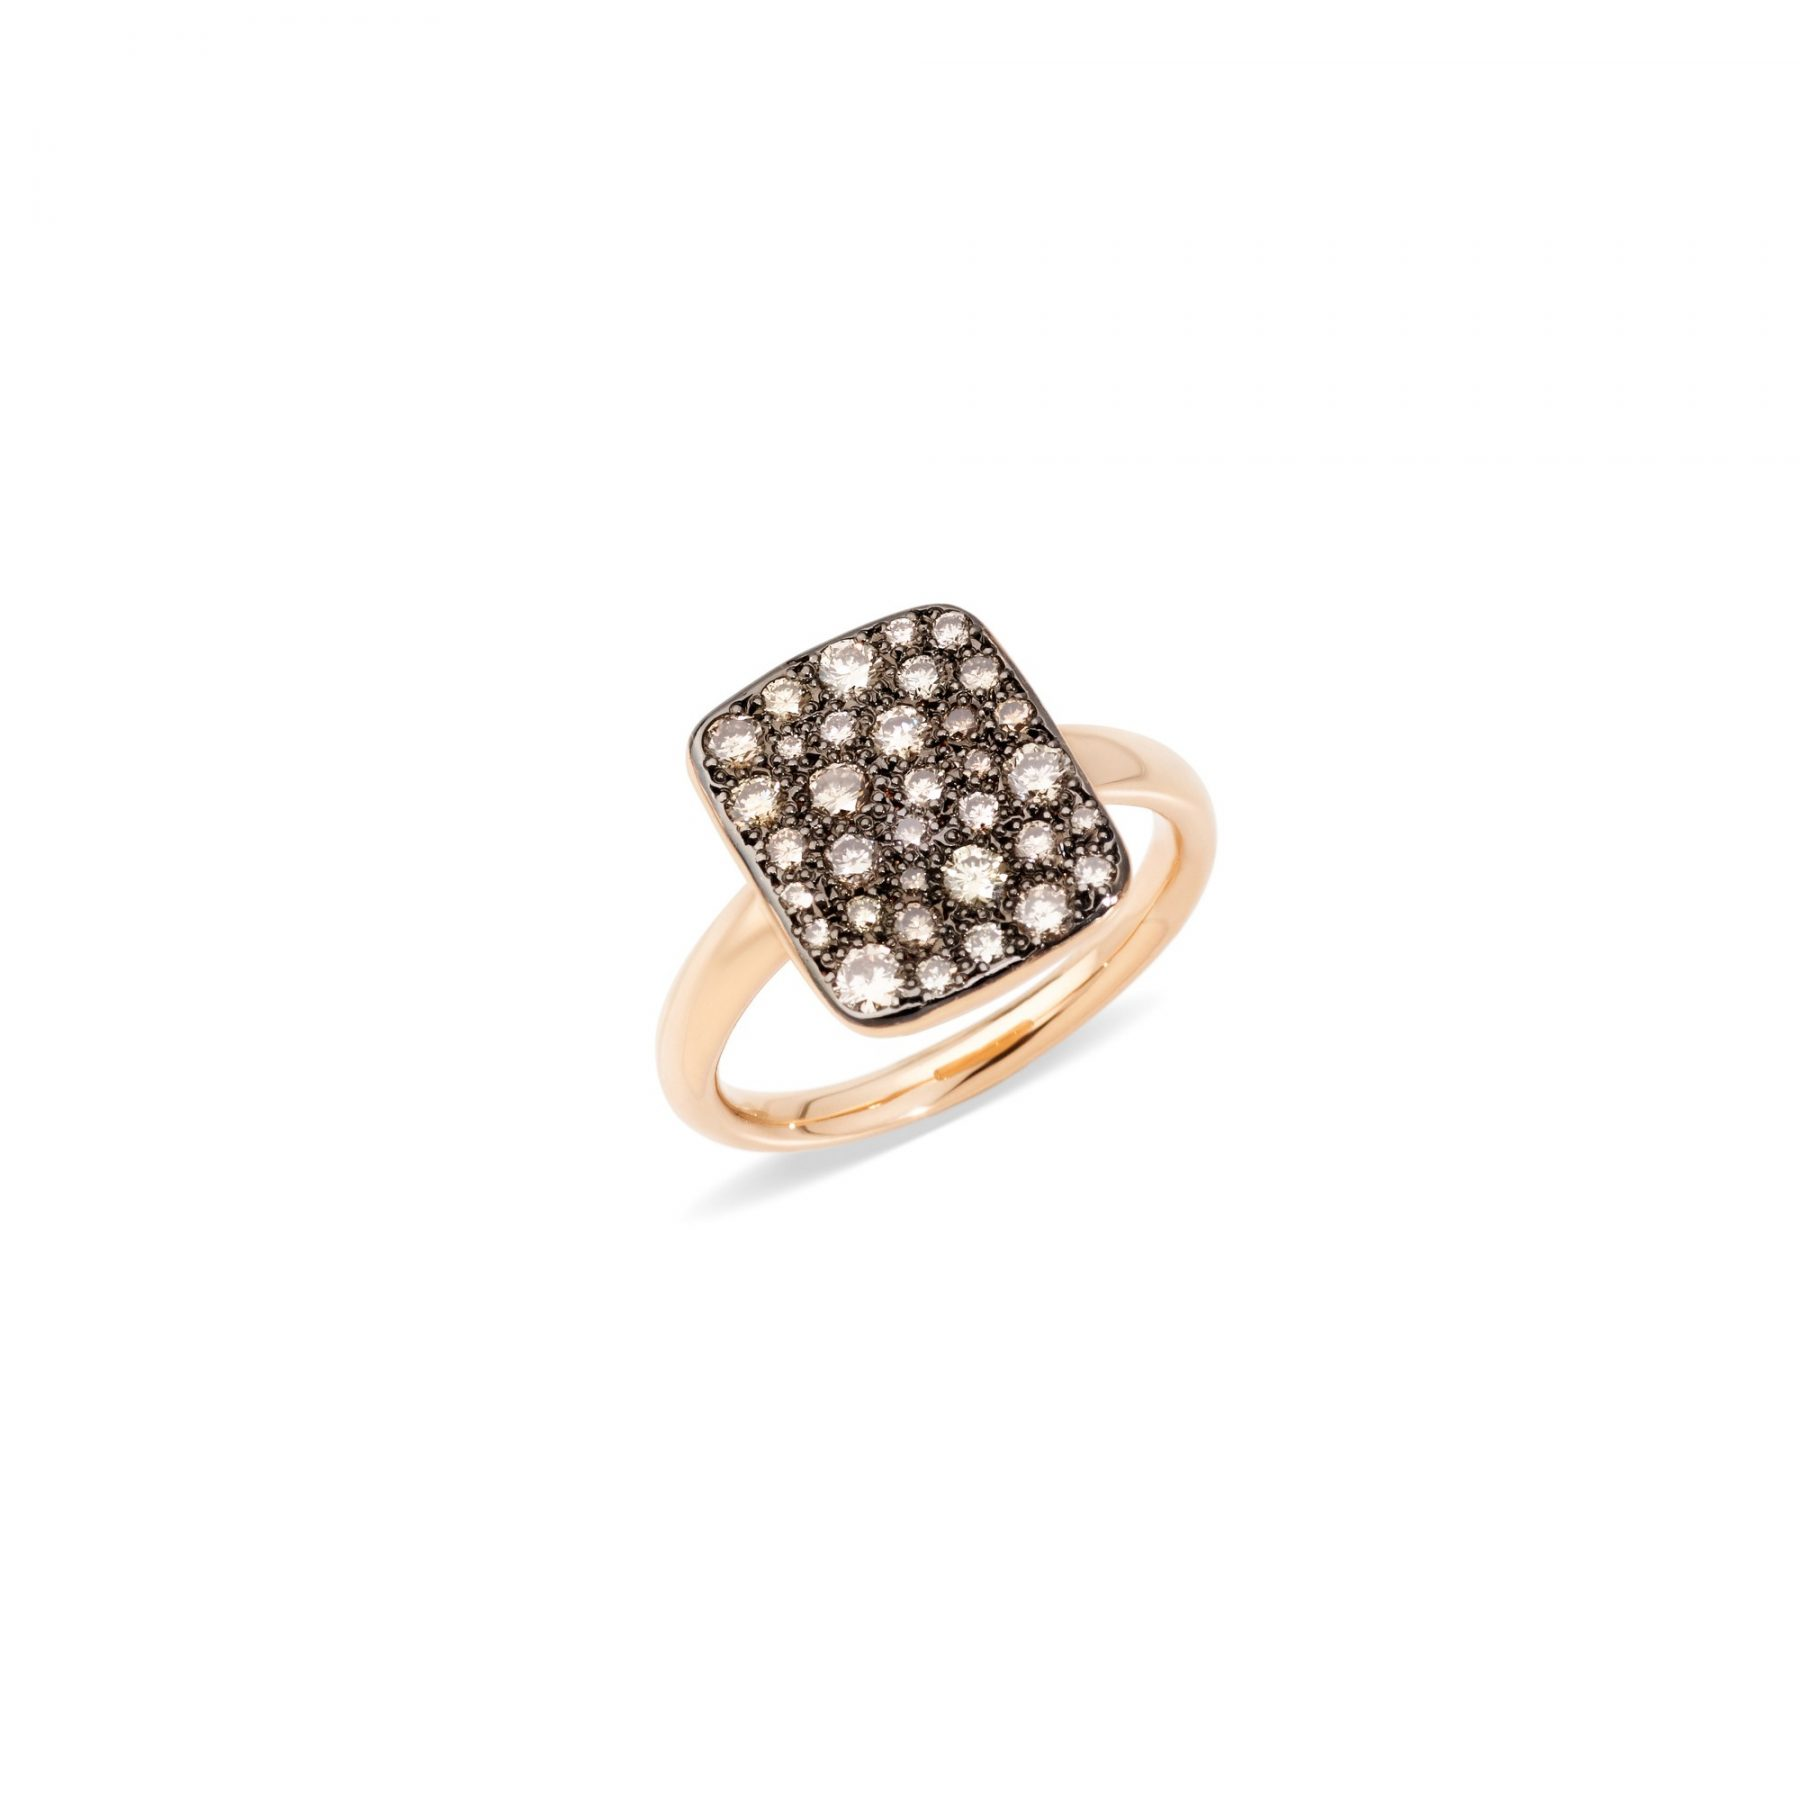 Ring Sabbia braune Diamanten - Pomellato - A.B903MO7/BR